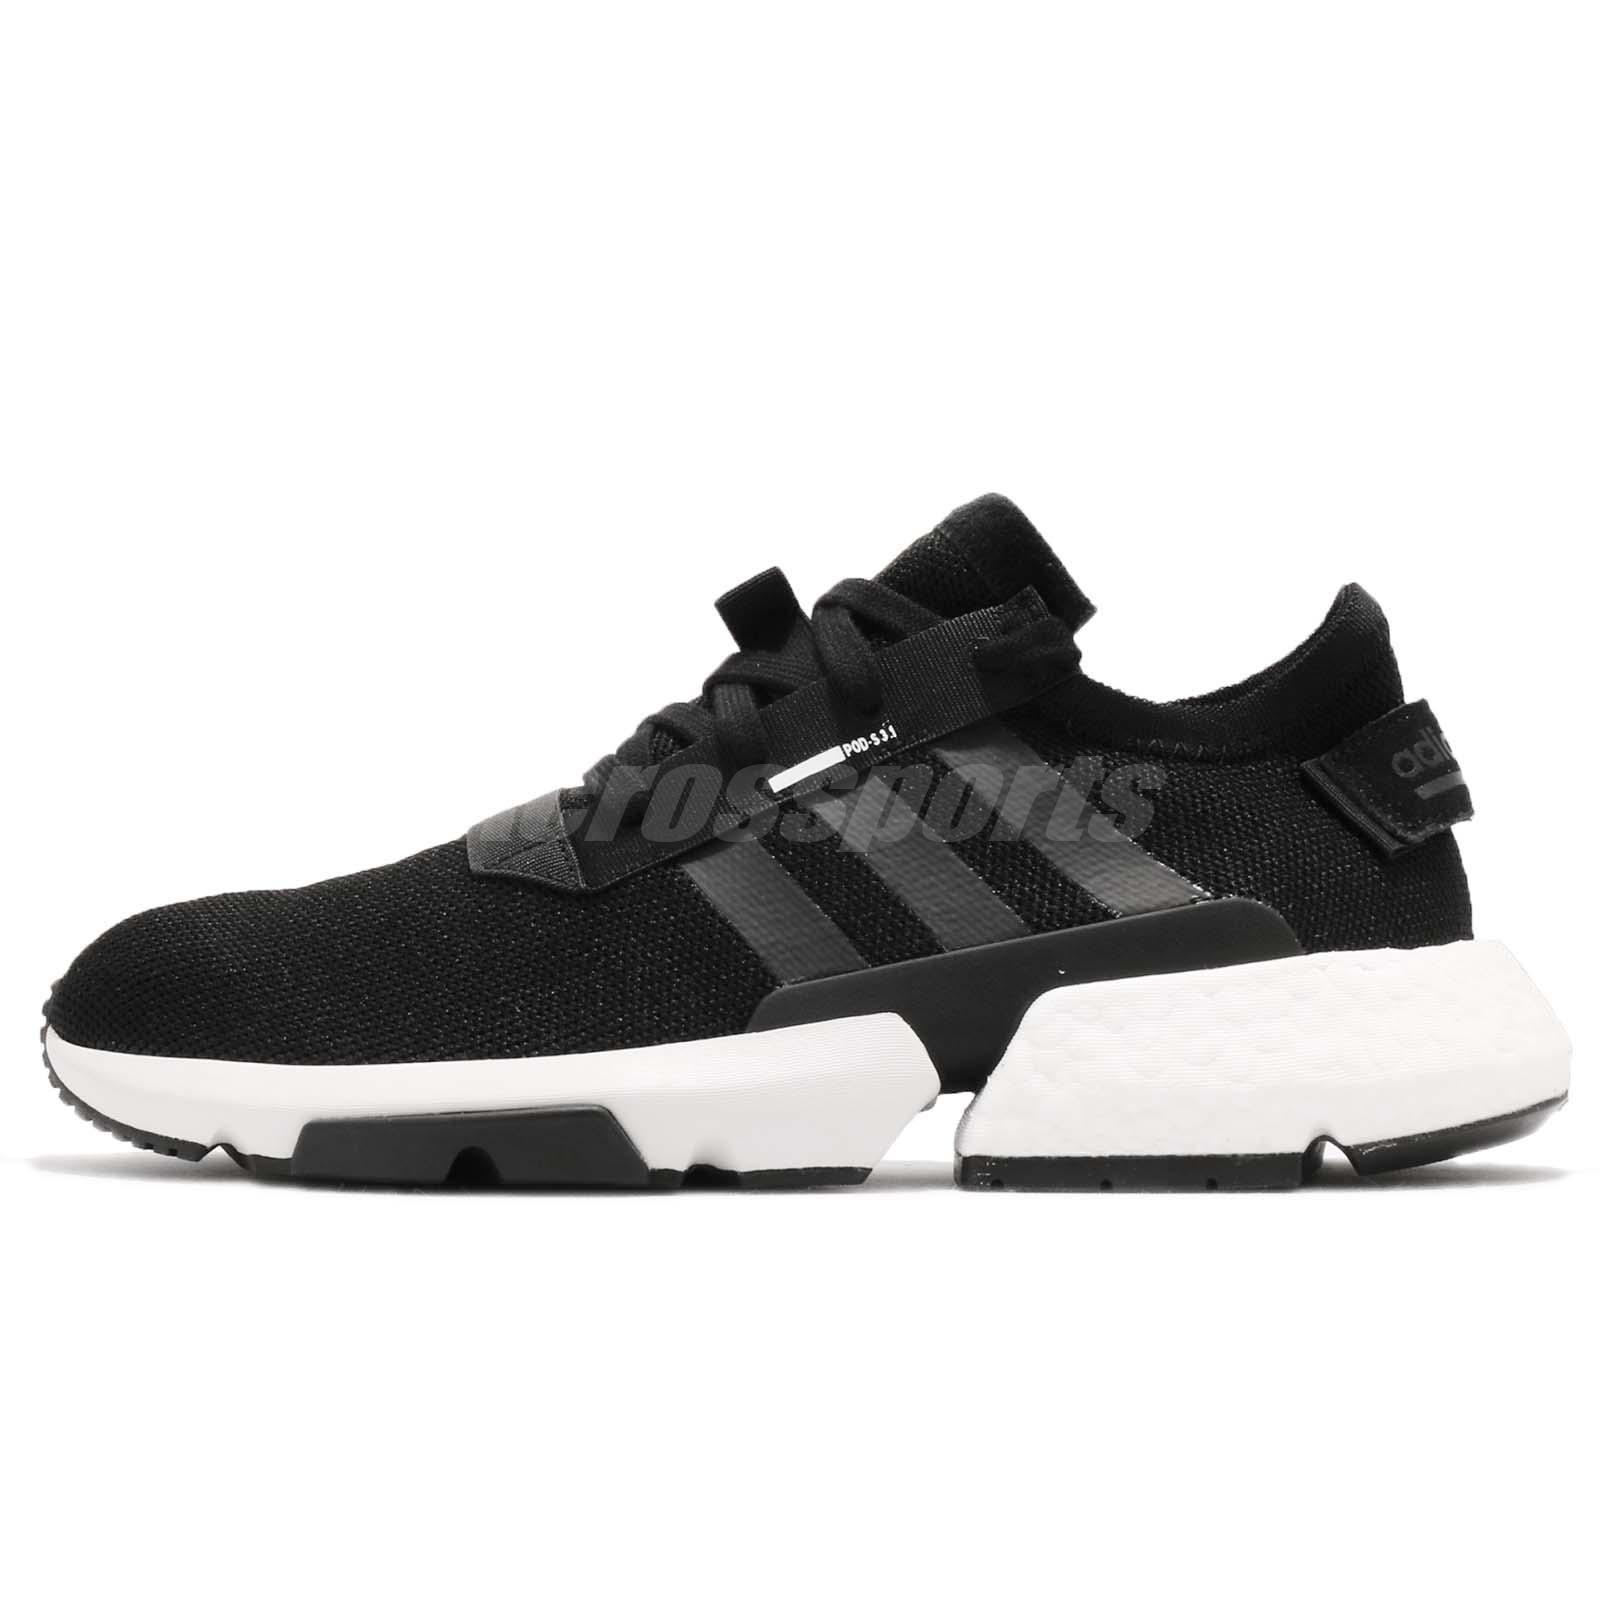 adidas Originals Pod-S3.1 System Boost Black White Men Running Shoes B37366 b14043e08fe